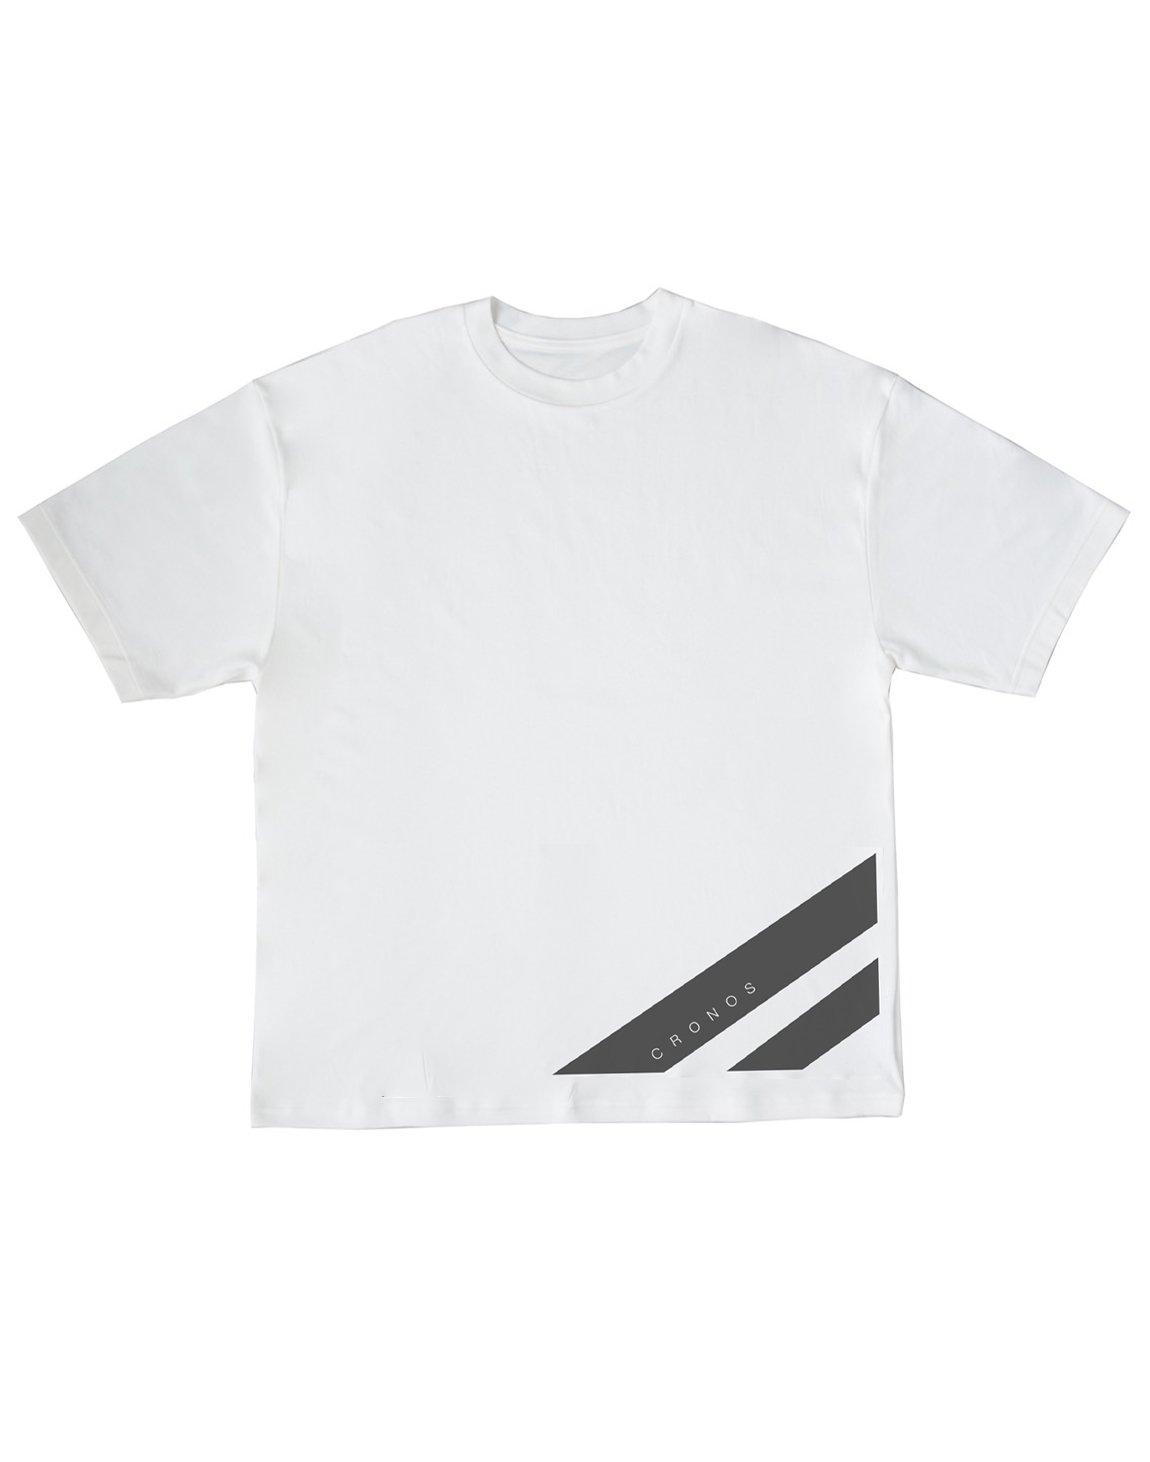 CRONOS STRIPE LOGO NEW OVER SIZE T-SHIRTS【WHITE】